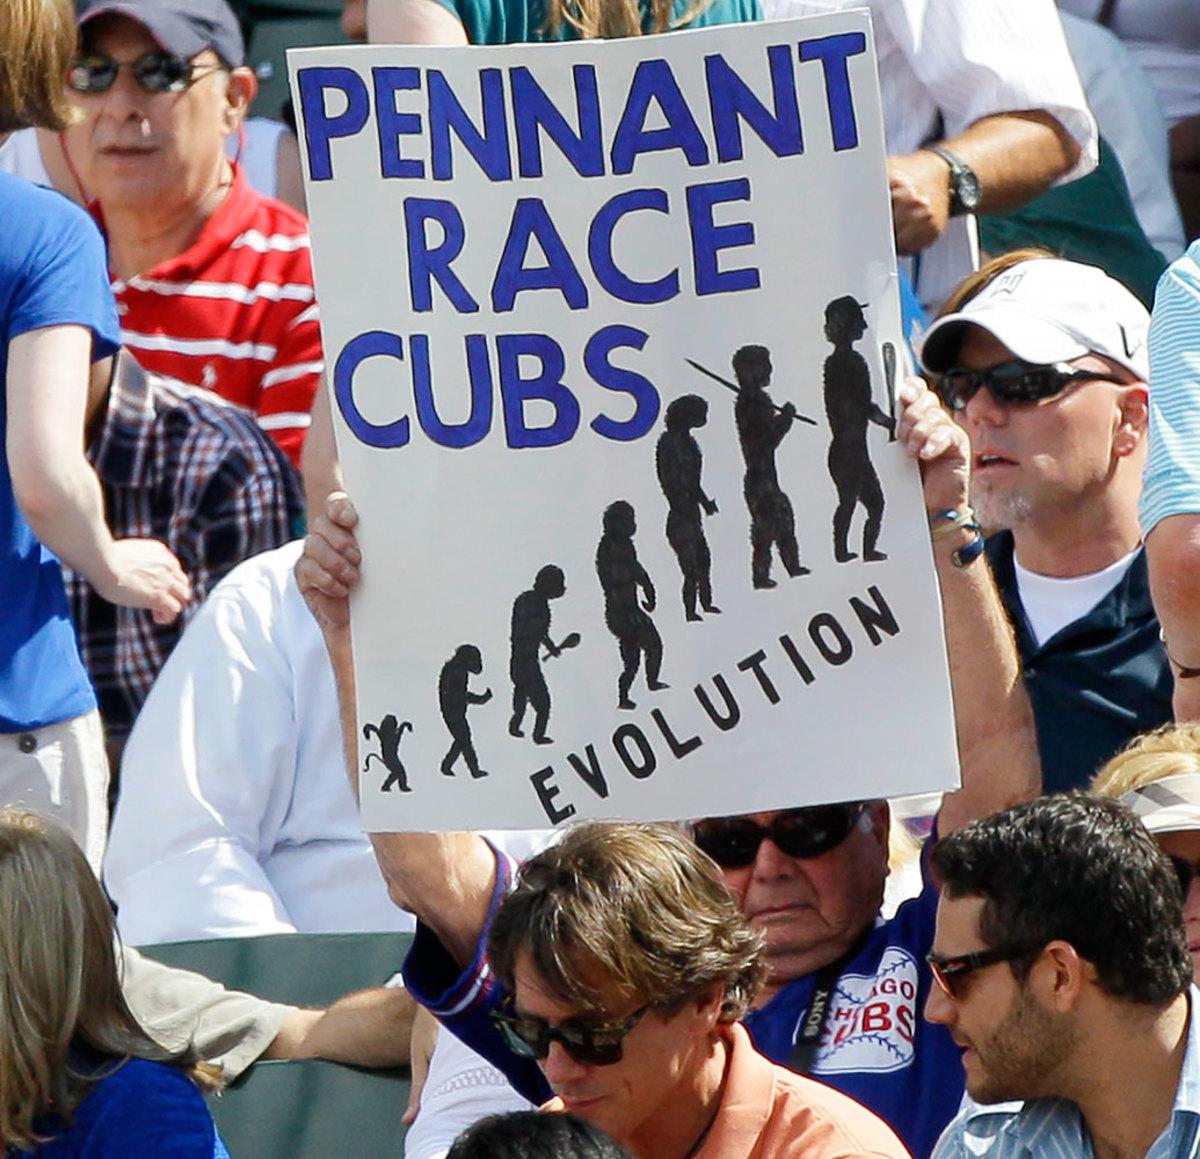 2011-Chicago-Cubs-fan-sign-AP_110904036008.jpg